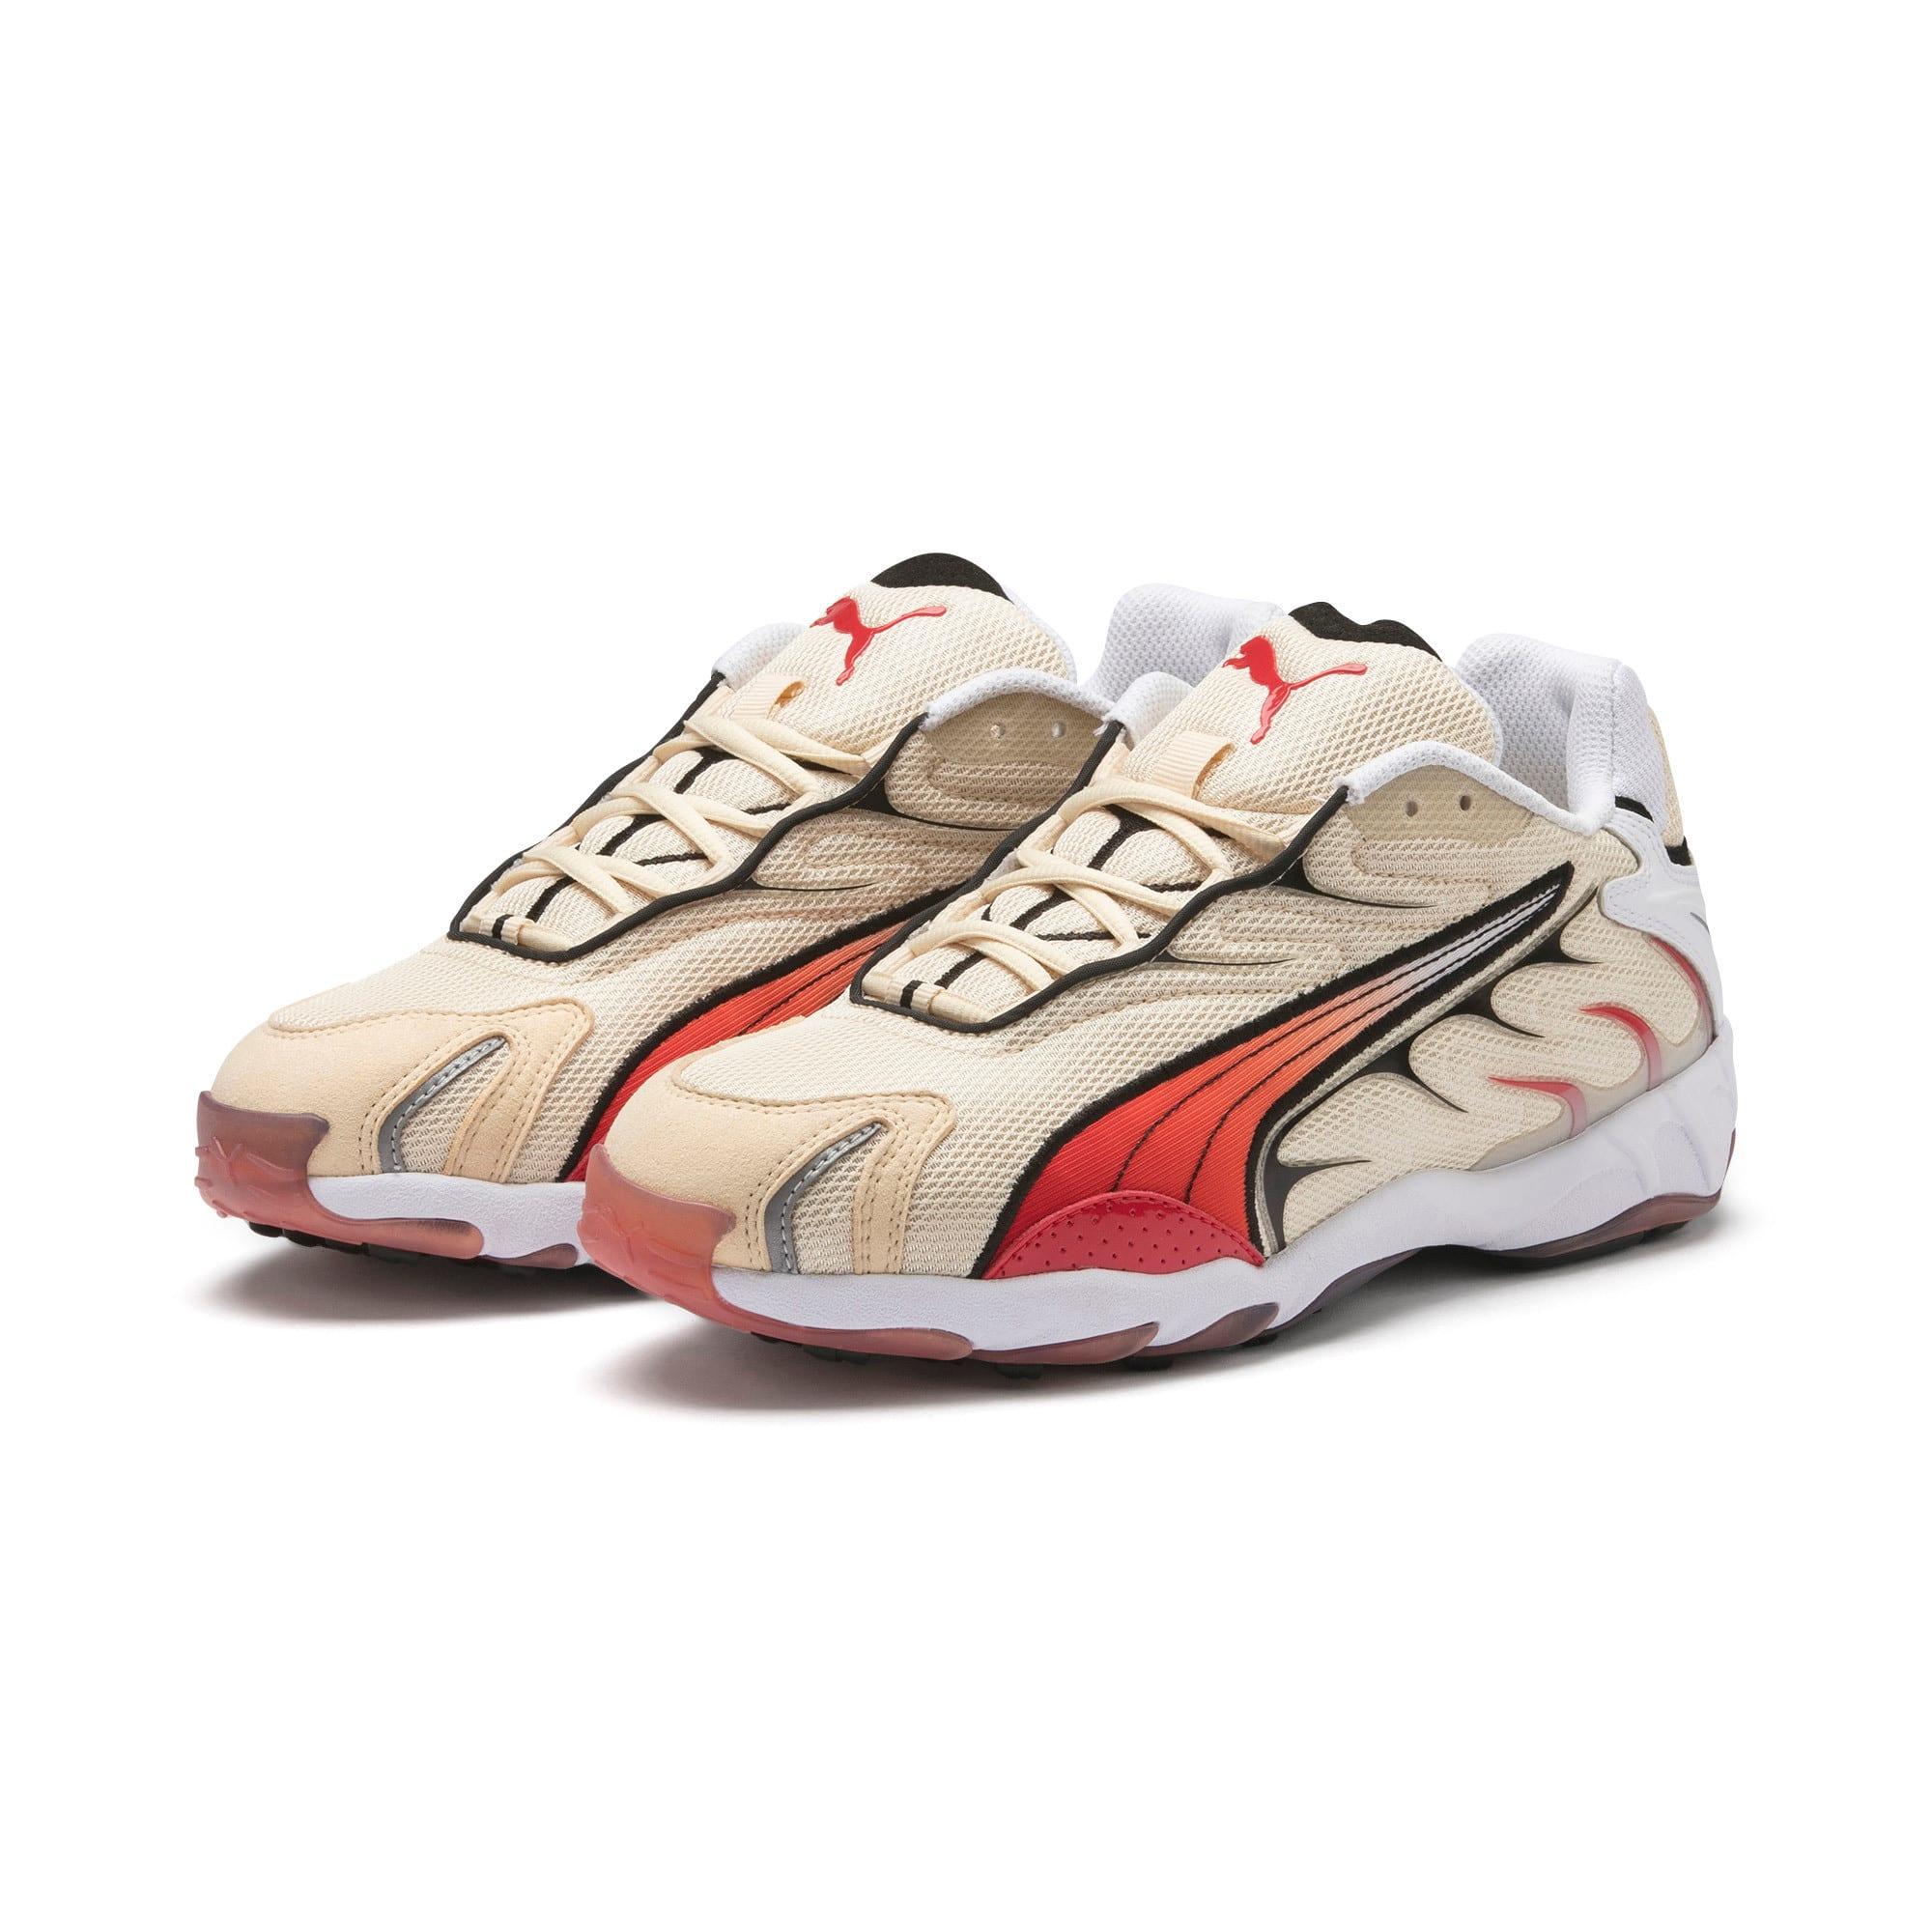 Thumbnail 3 of Inhale Sneakers, Summer Melon-High Risk Red, medium